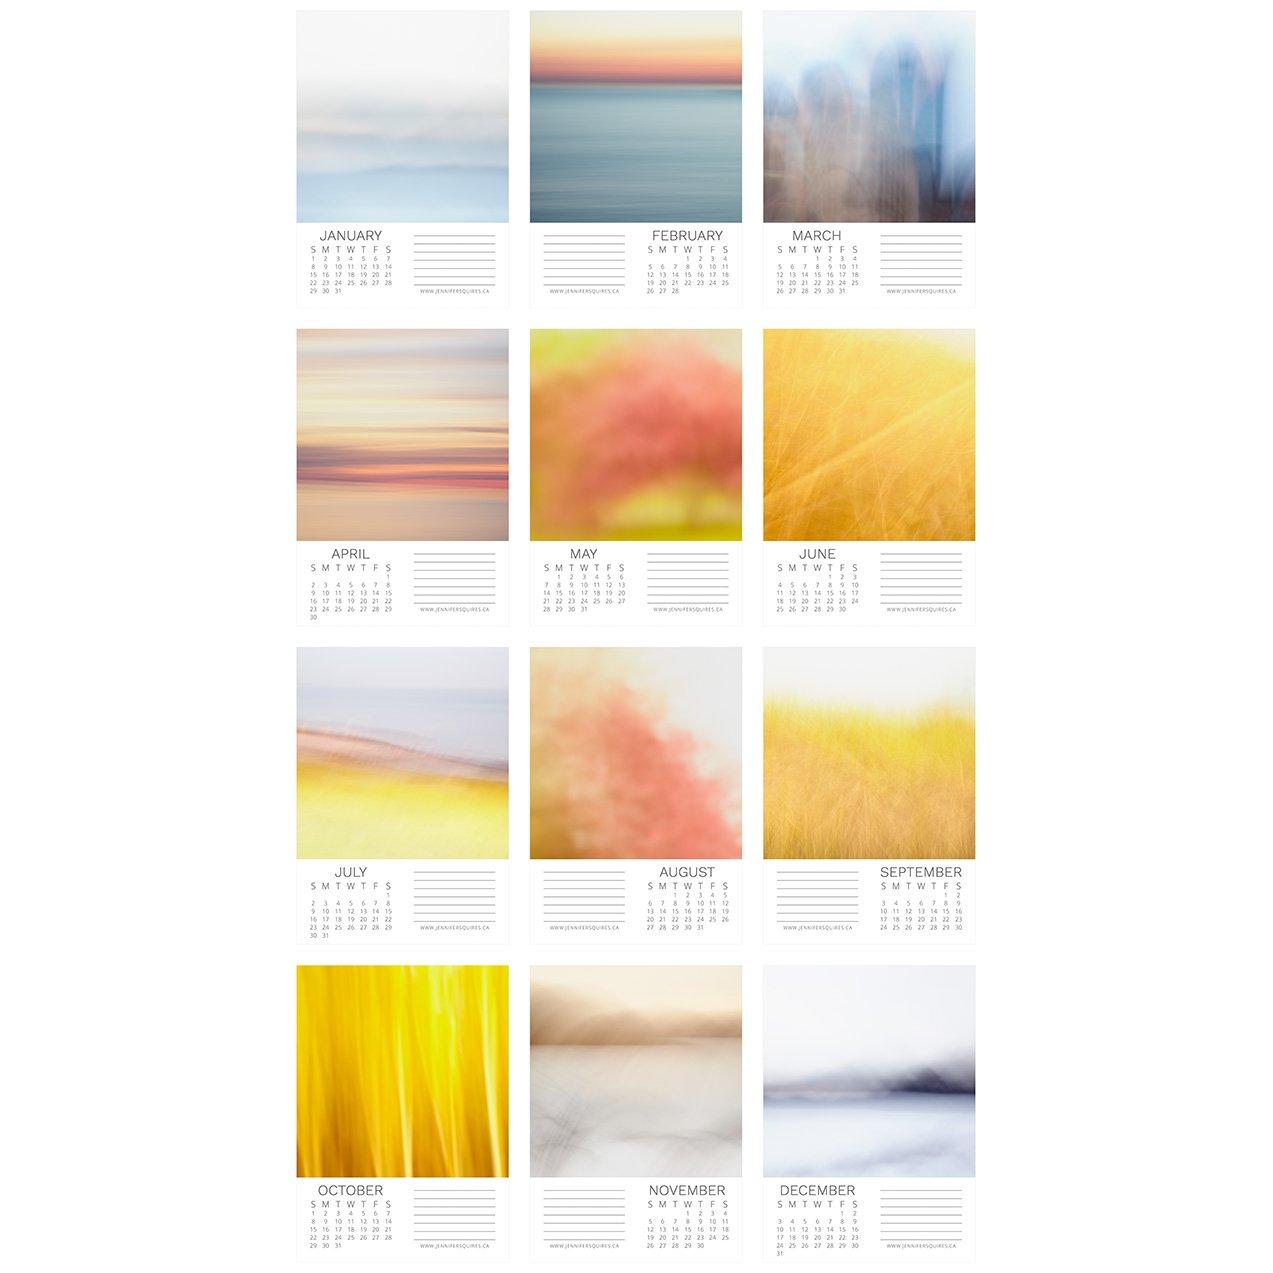 Calendar Abstract Art : Soothing abstract art calendar colourful landscape